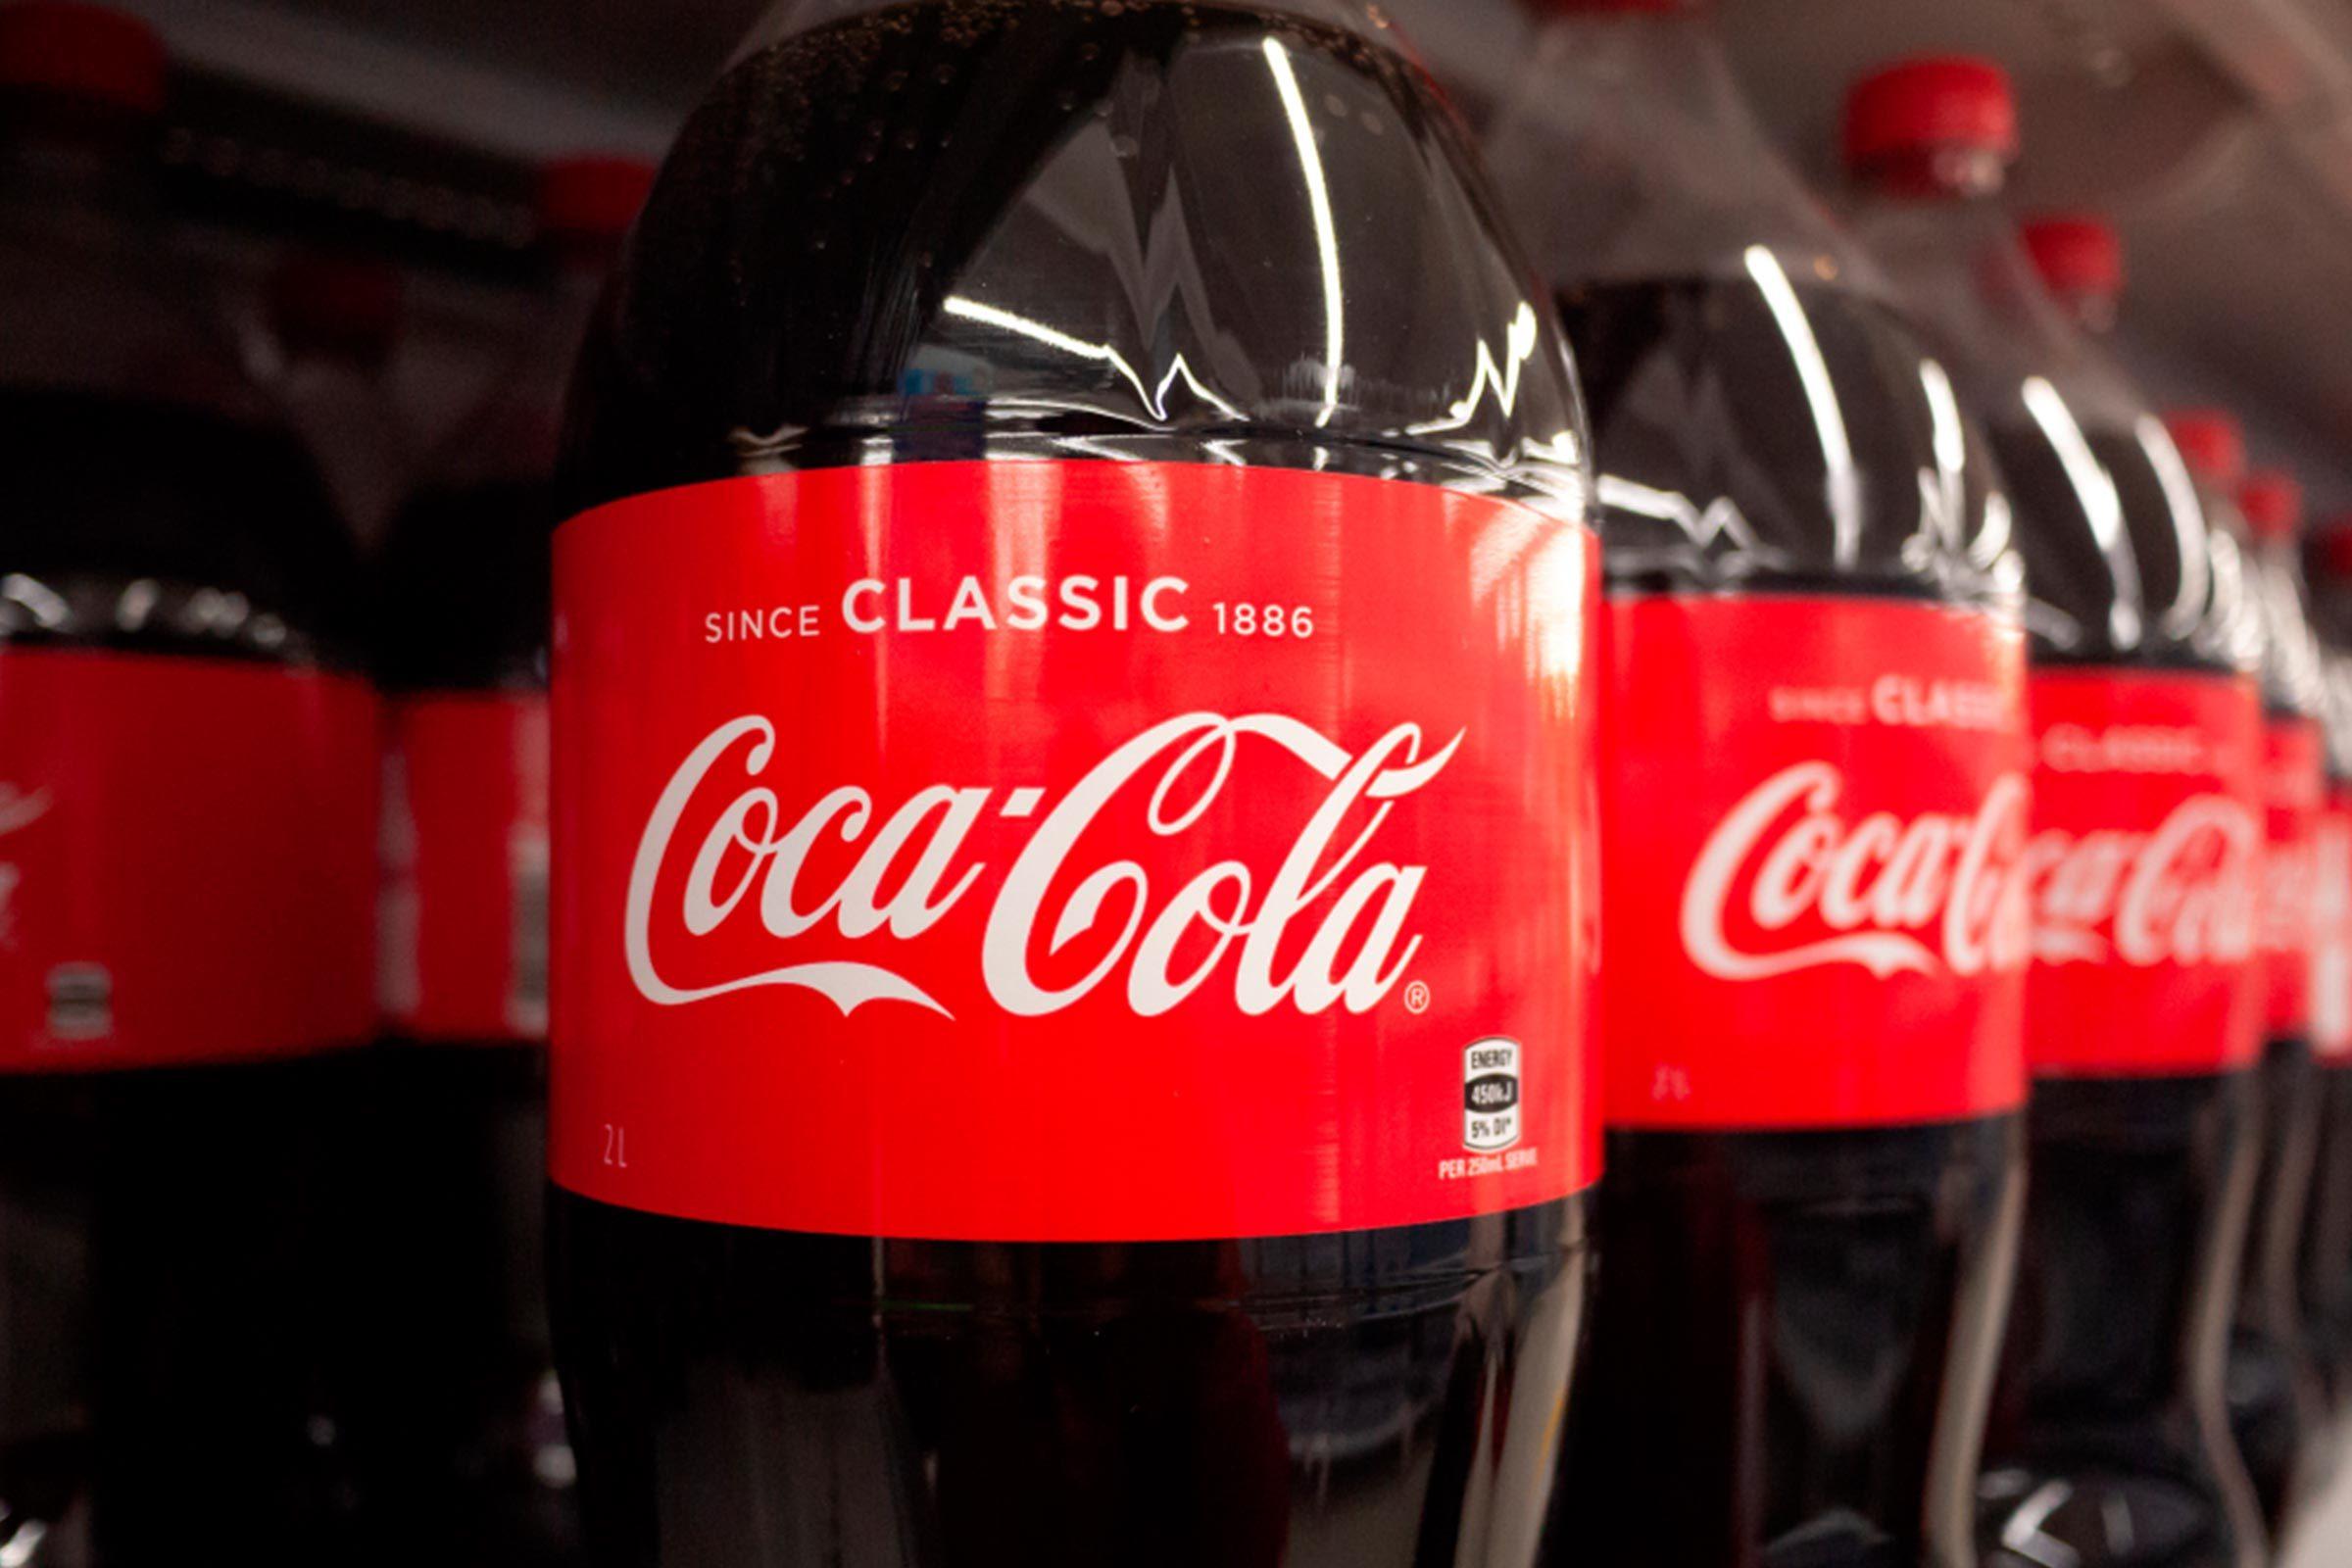 Coca-cola 2 liter bottle